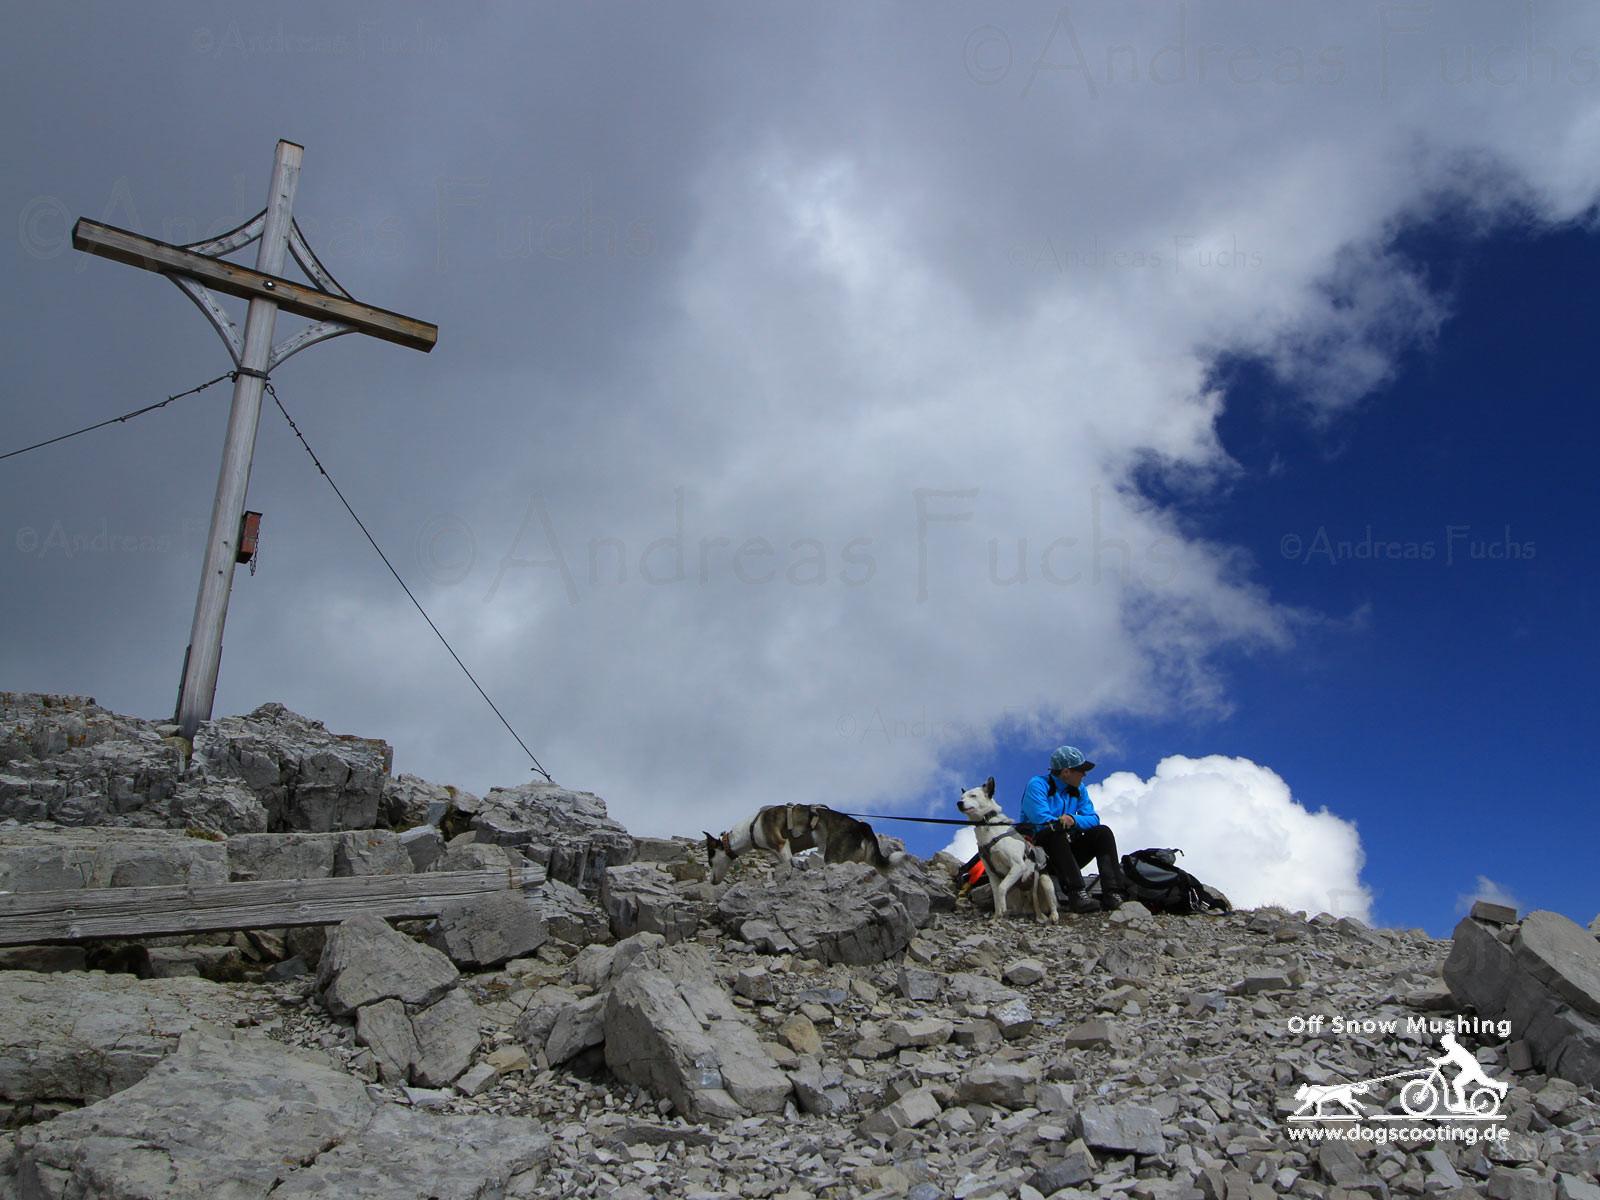 Gipfelkreuz Namloser Wetterspitze